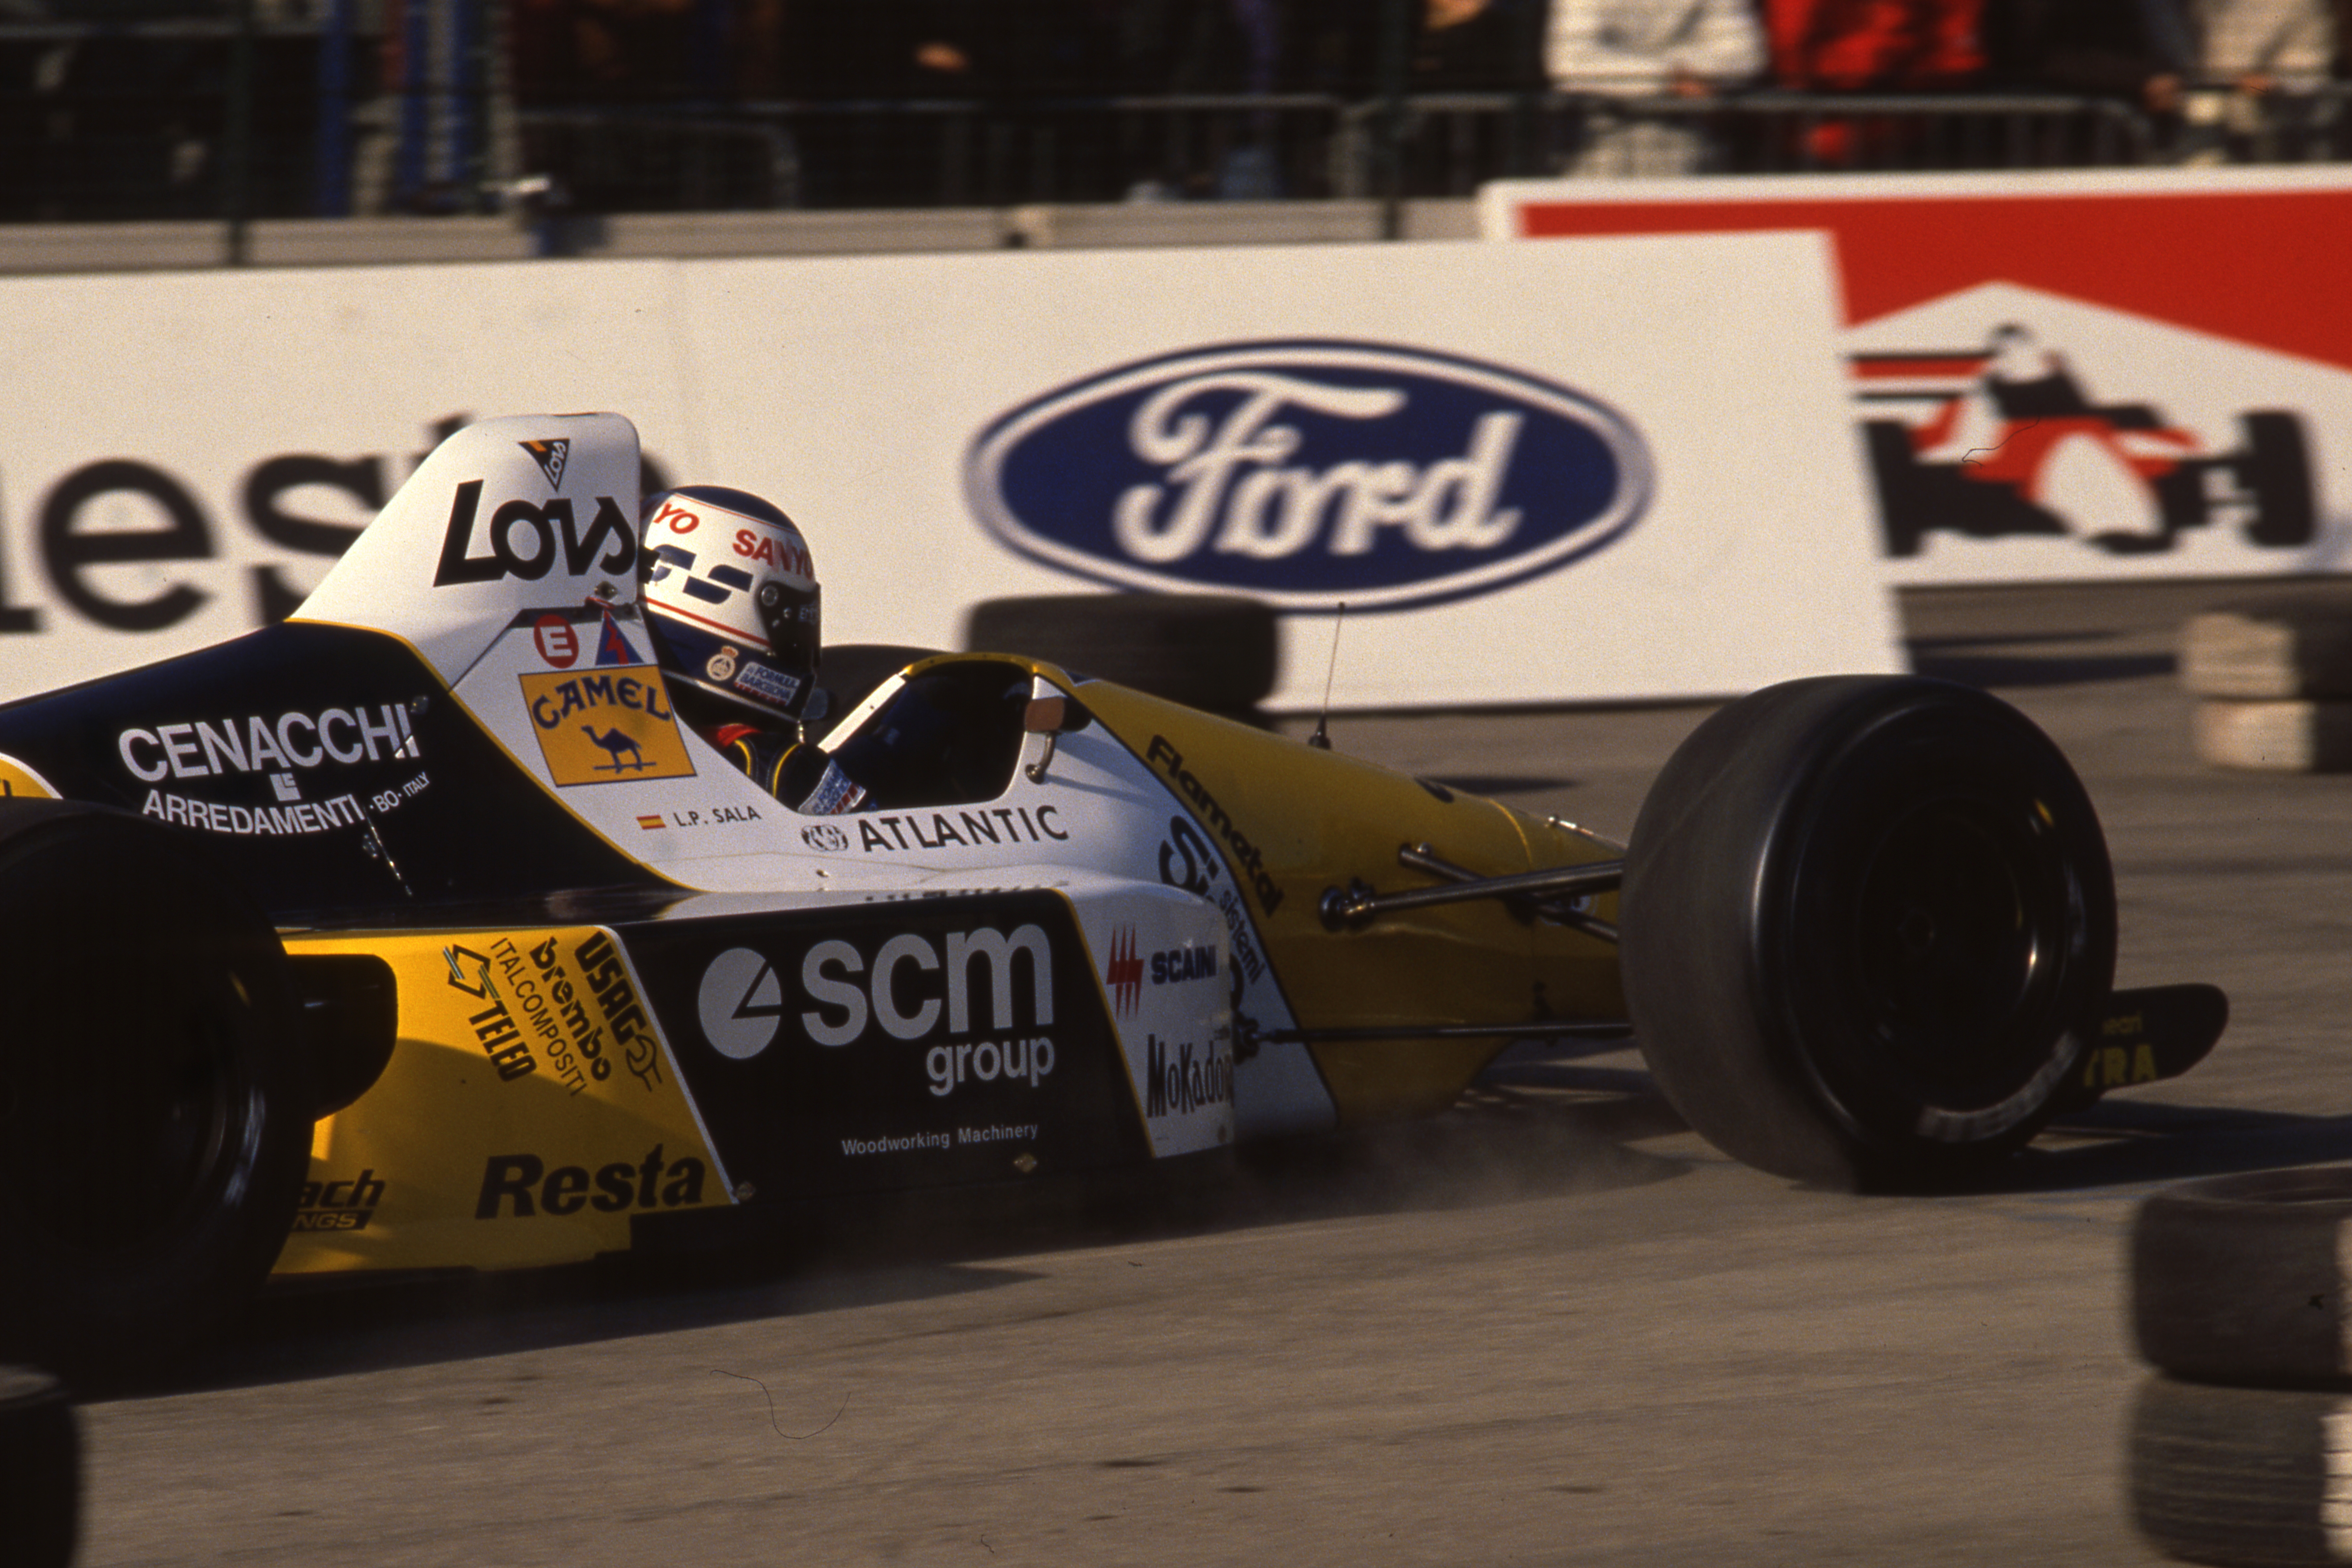 Motor Show Formula One Indoor Trophy Bologna (ita) 02 03 12 1989